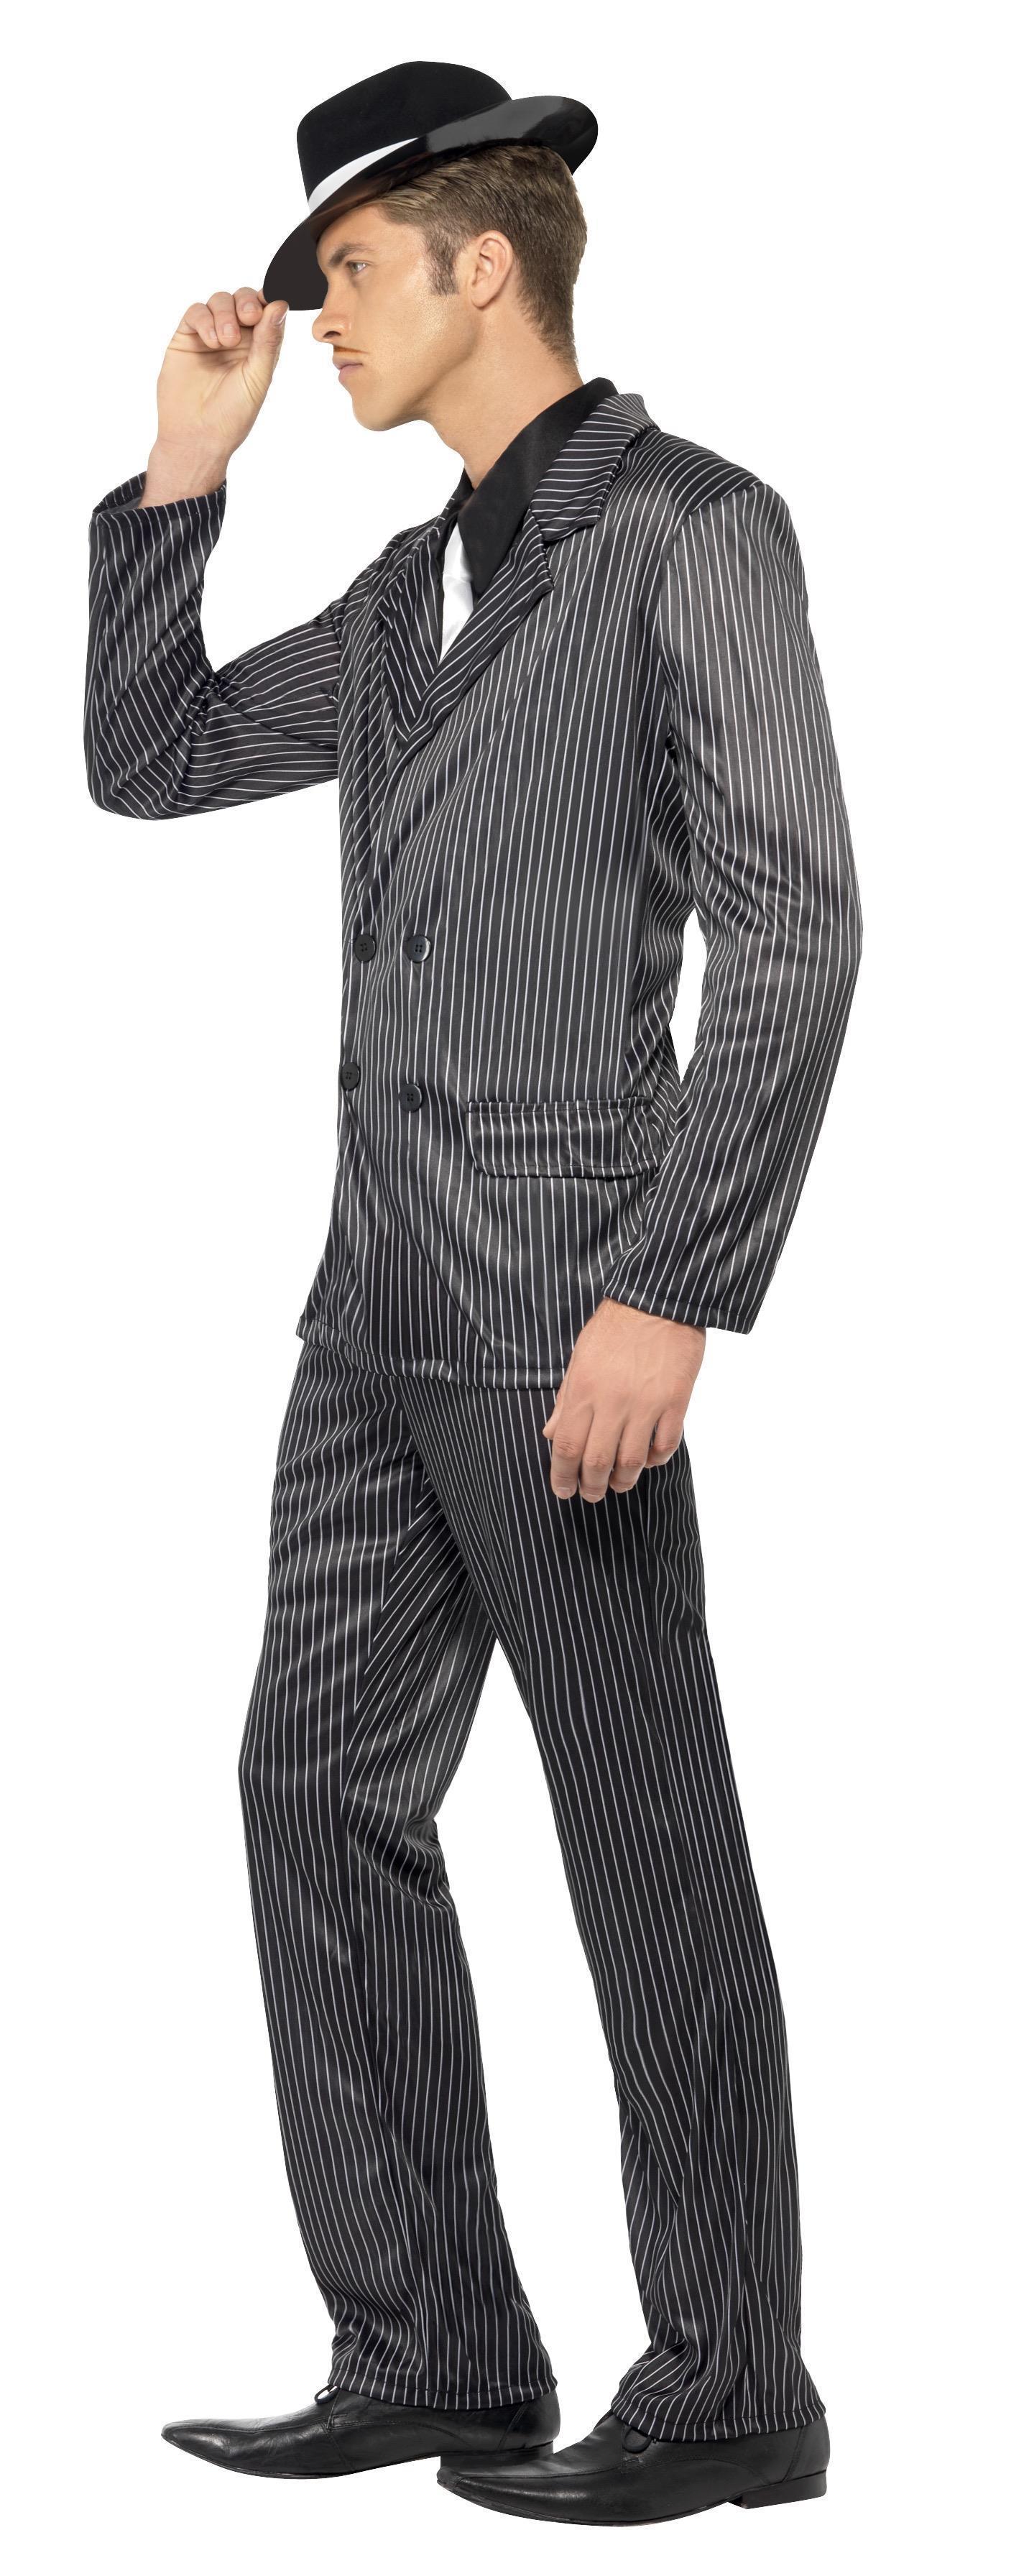 Marilyn Monroe Tommy Gun: 20s Gangster Costume Black Pinstripe